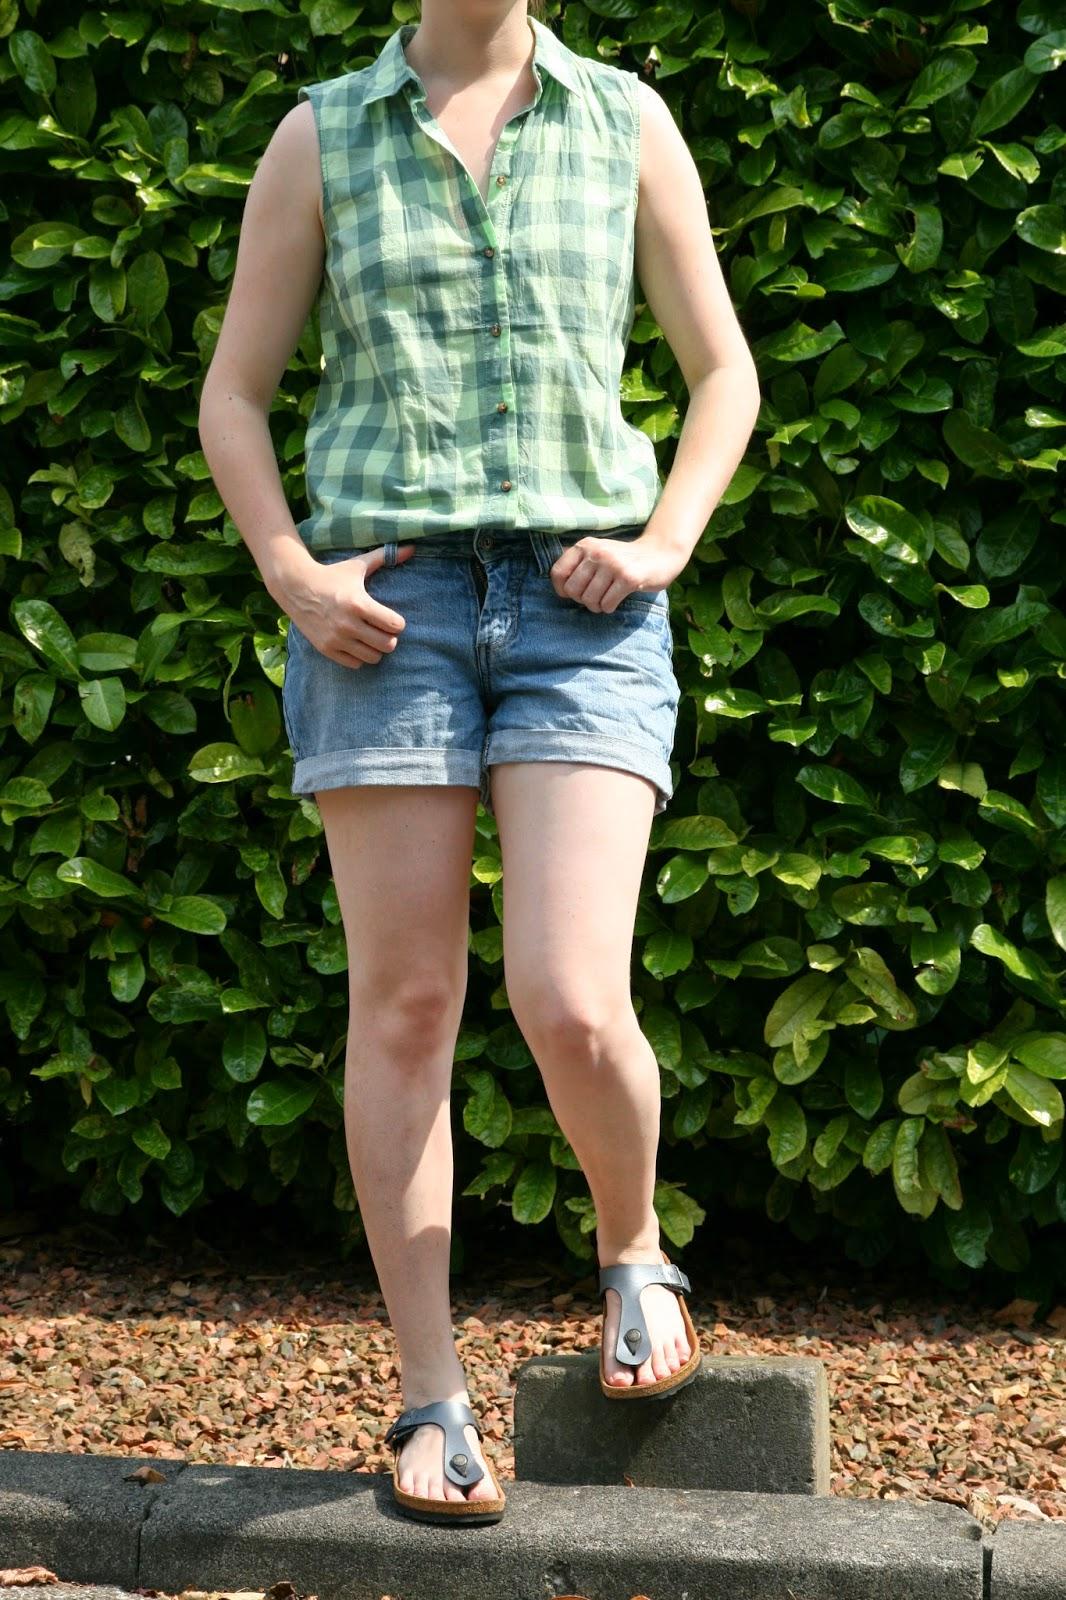 http://hmlovur.blogspot.nl/2014/07/outfits-of-week-week-29.html